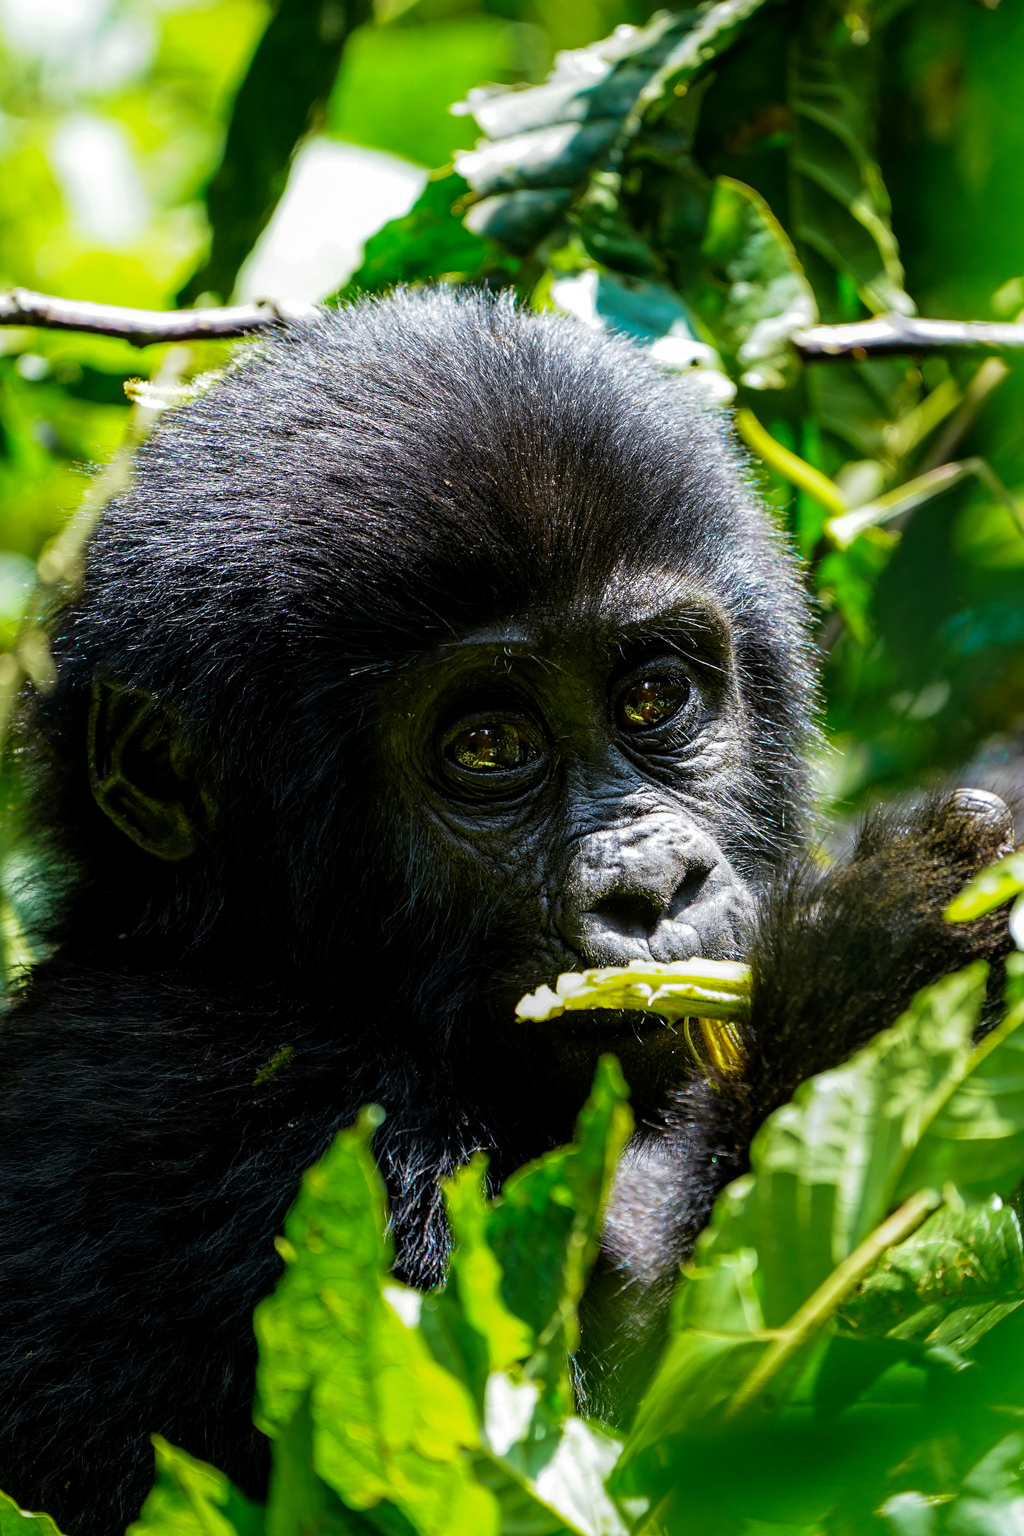 Highlights in Uganda: Gorillas, Löwen, Giraffen & Wasserprojekte 147